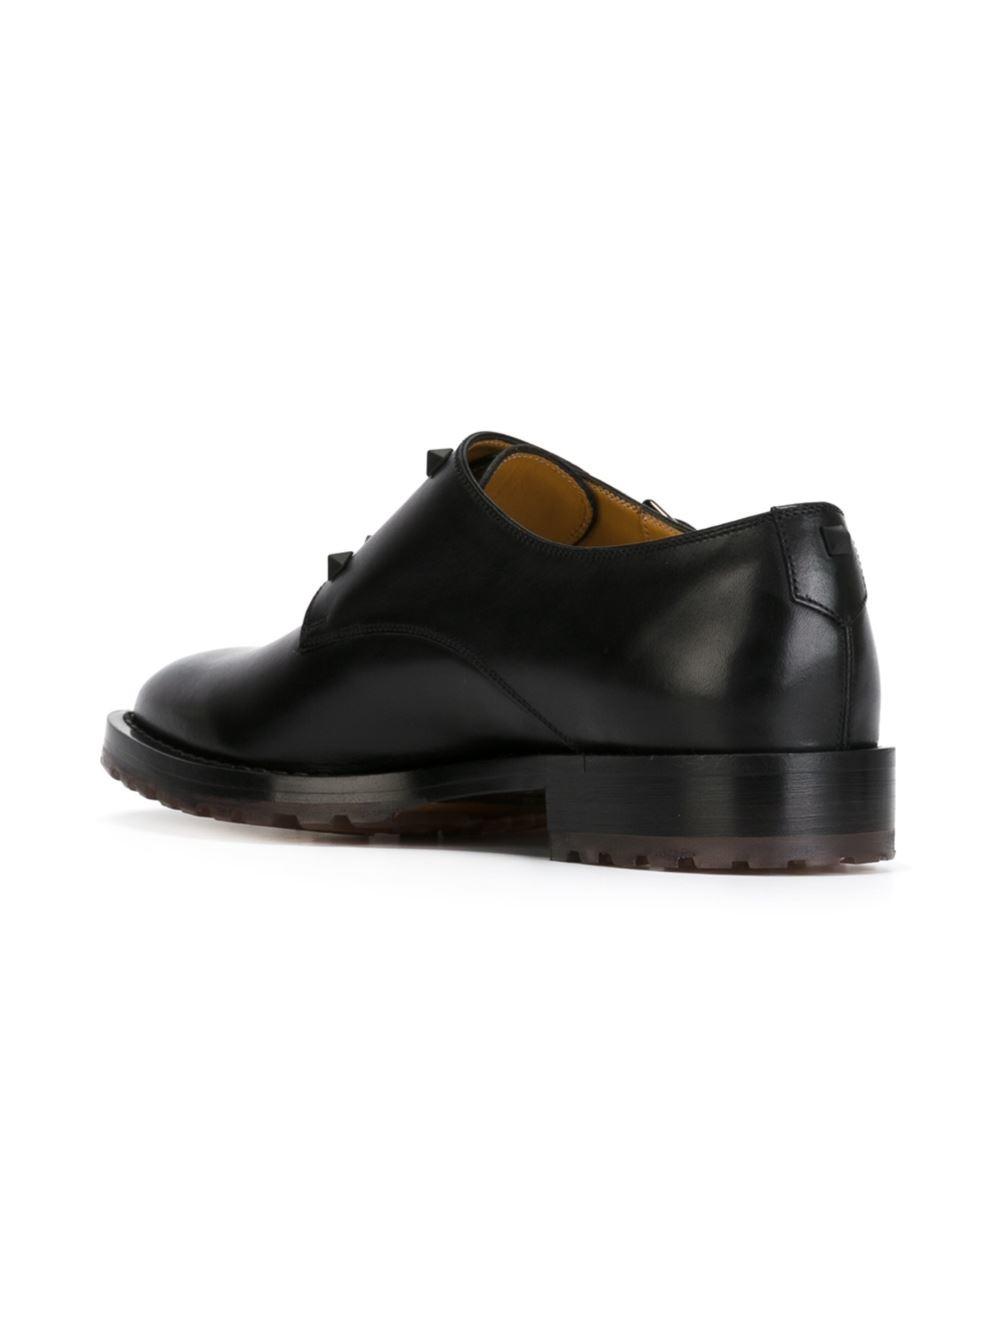 valentino garavani rockstud buckled shoes in black for